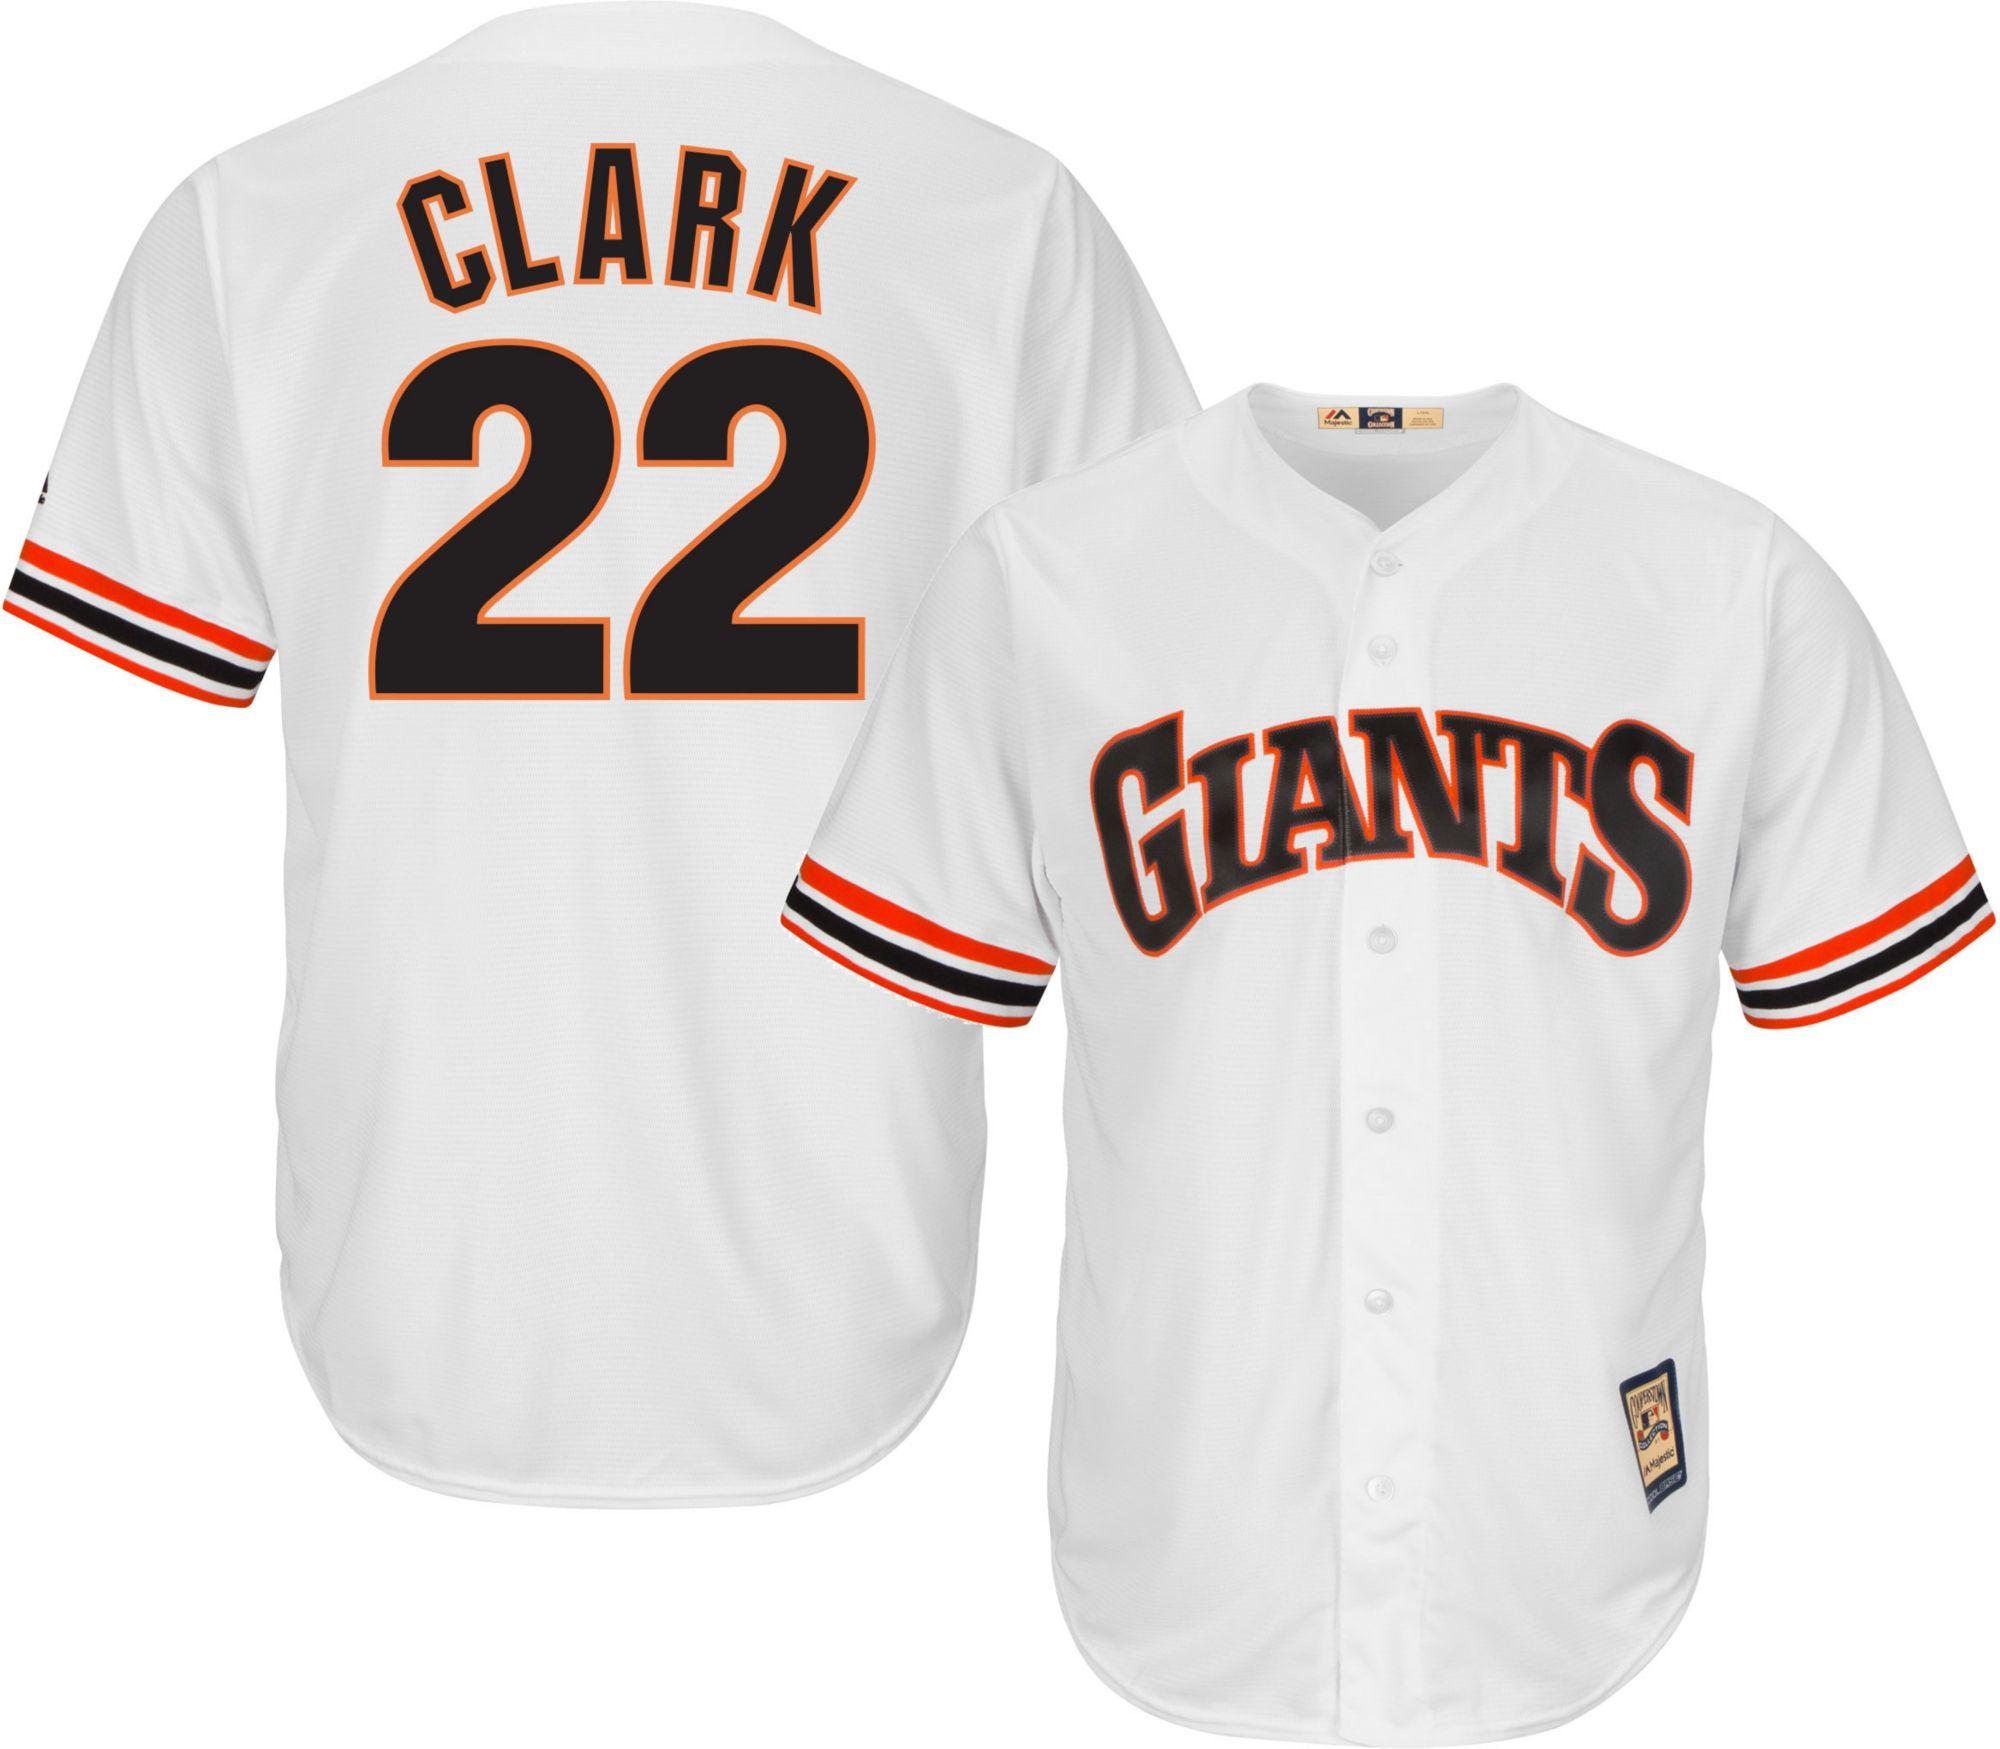 reputable site bb4d7 6eefa san francisco giants will clark jersey